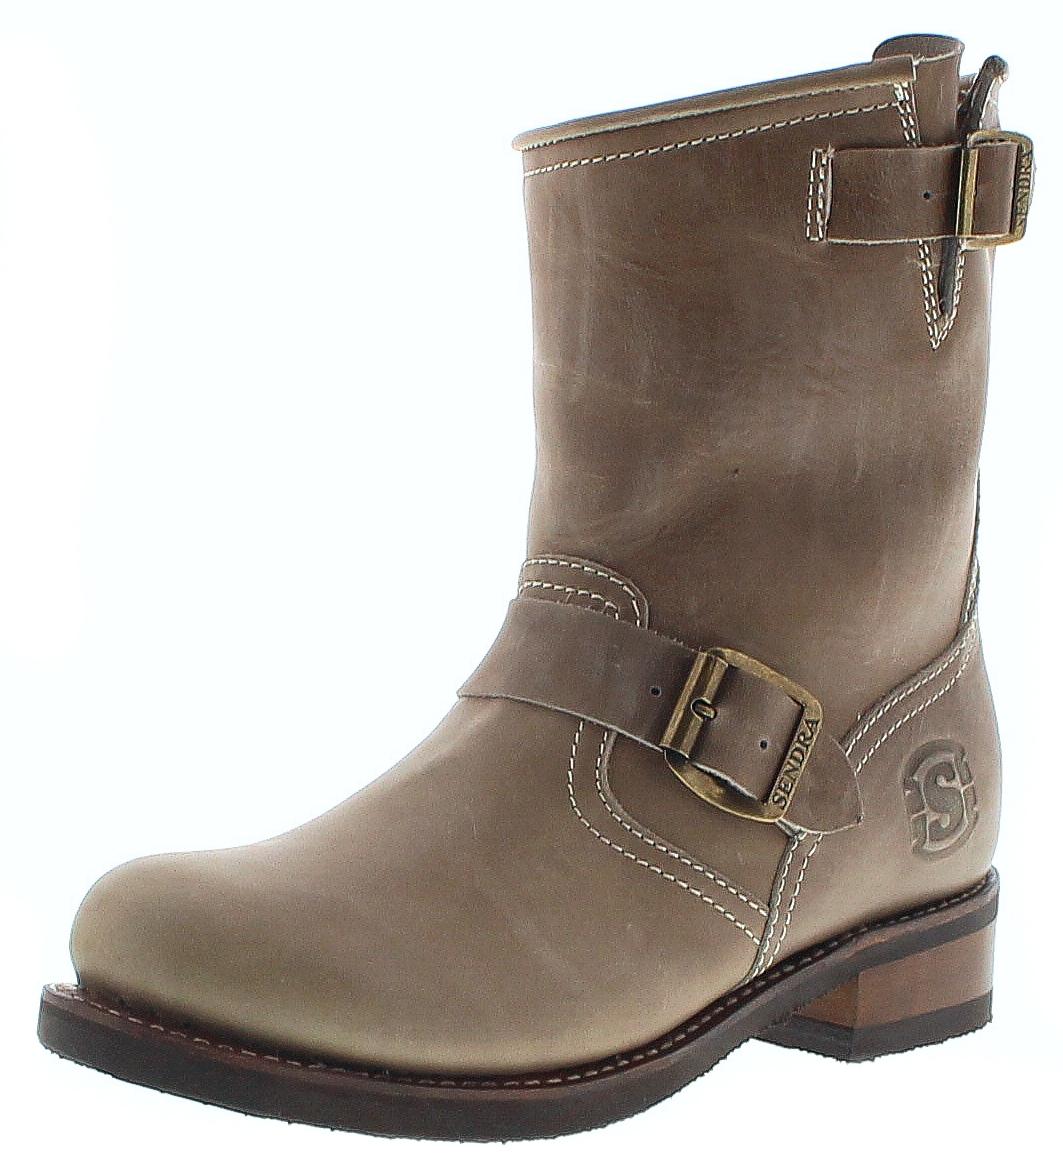 Sendra Hueso Engineer Stiefel Boots Braun Mit Merinofell Futter Damen 10849 Merenillo nwX08kOP